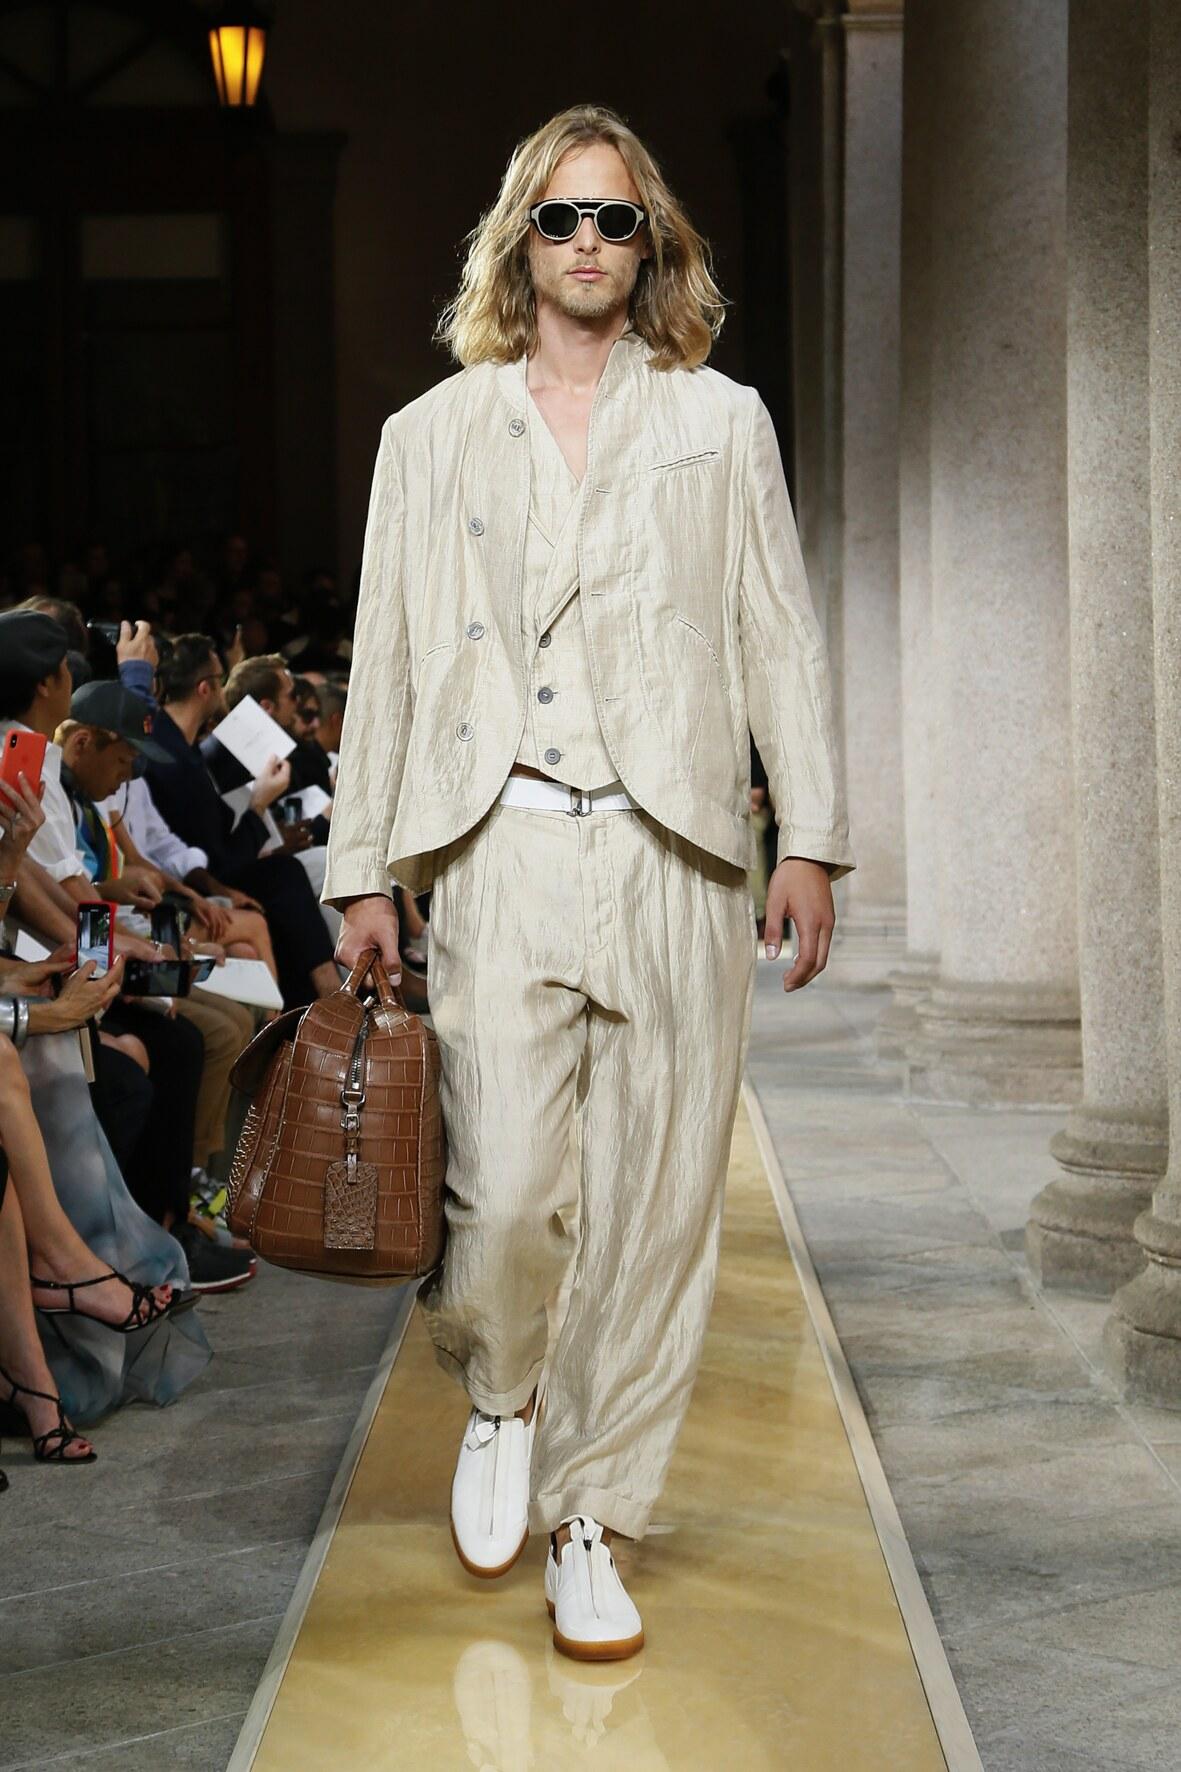 Fashion Model Man Giorgio Armani Catwalk